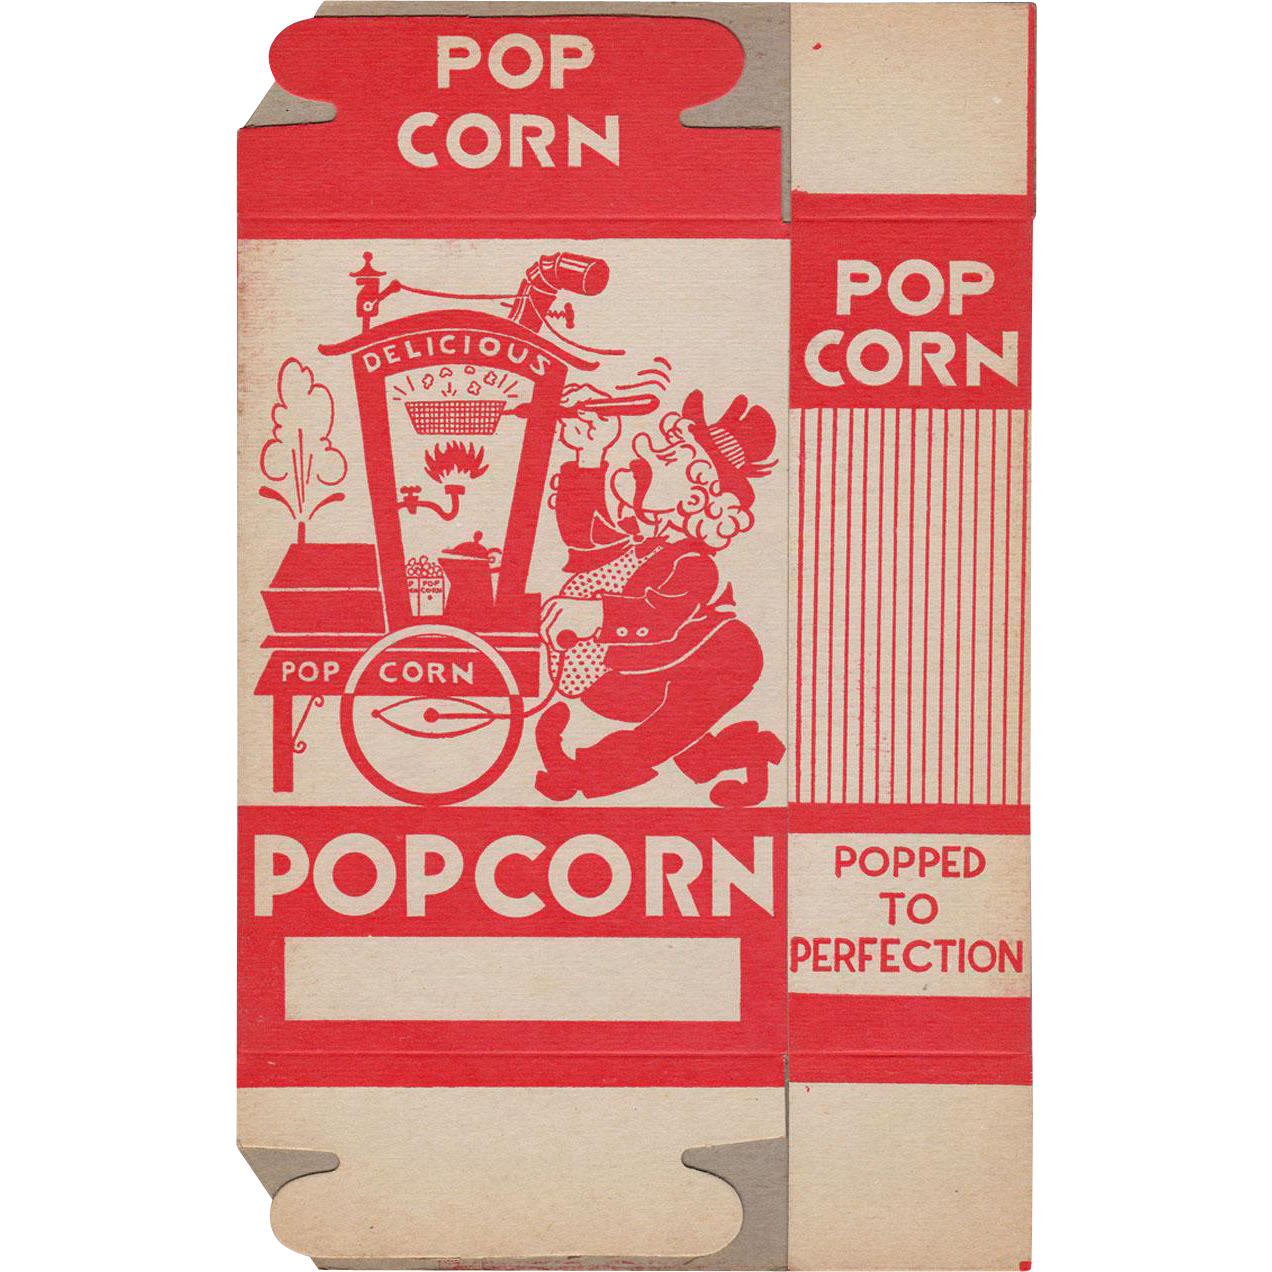 Vintage Popcorn Box - Popcorn Vendor Graphics - Never Used